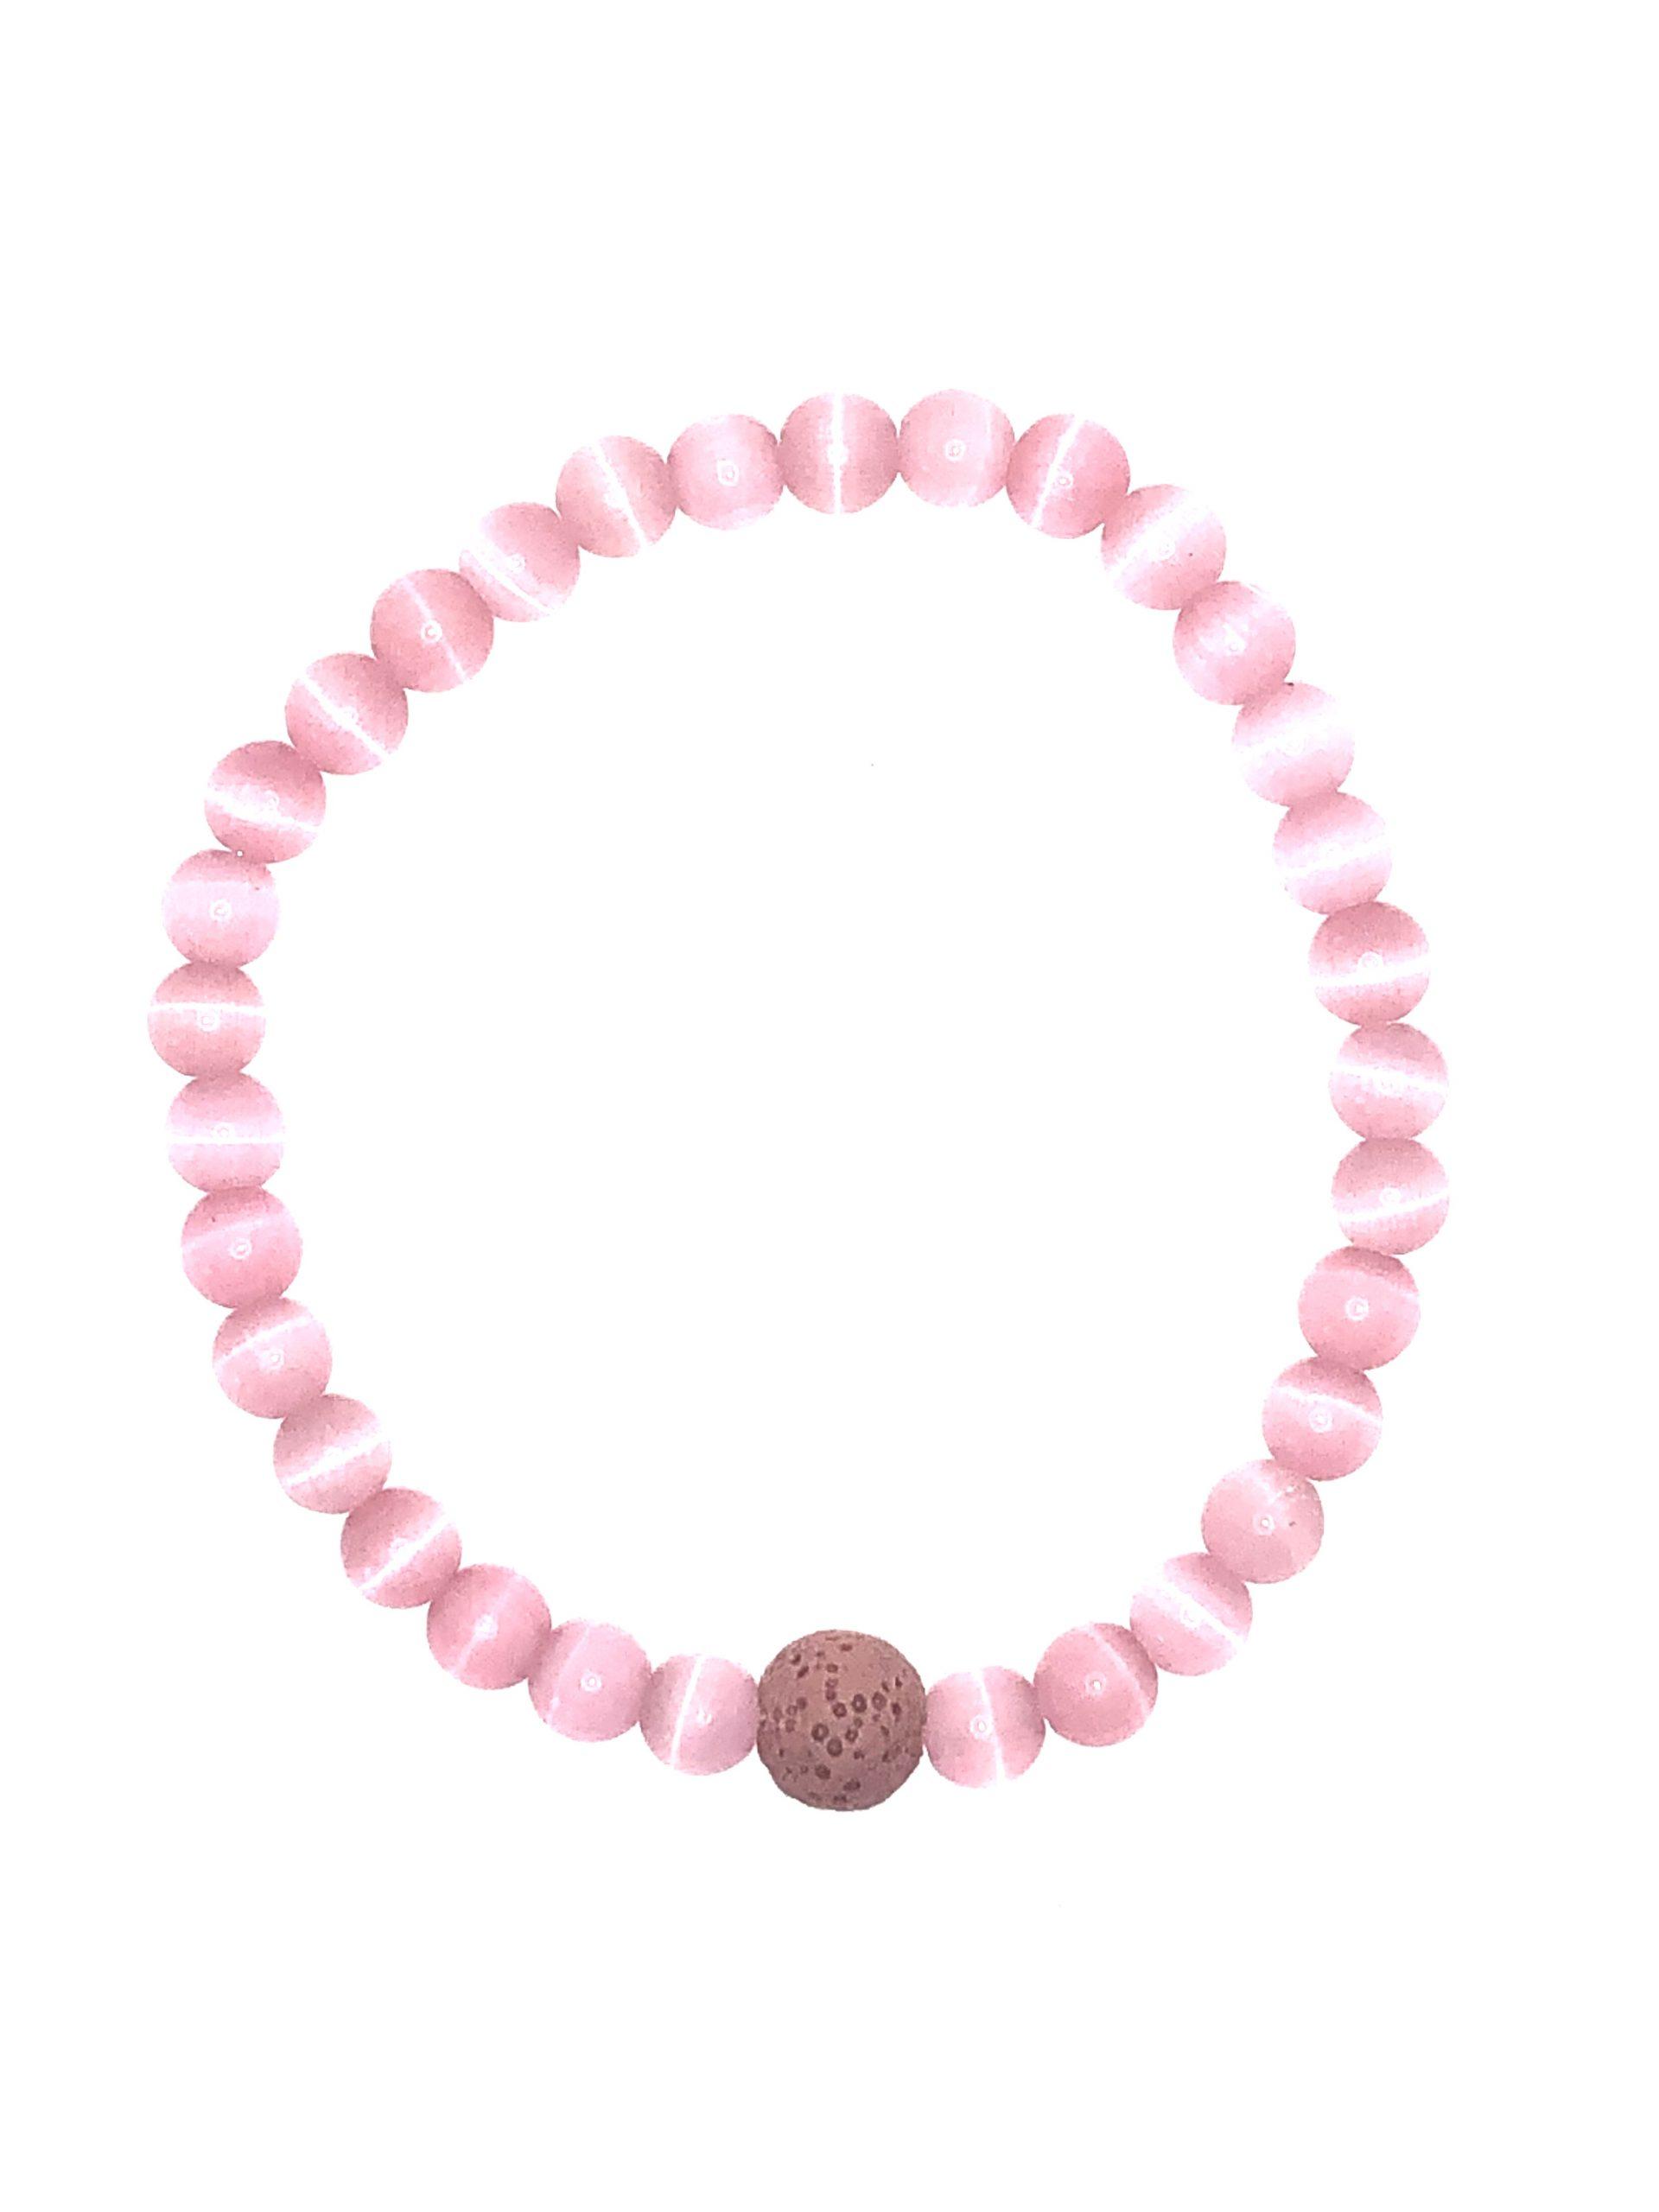 Pink Cat's Eye Beaded Bracelet for sale online